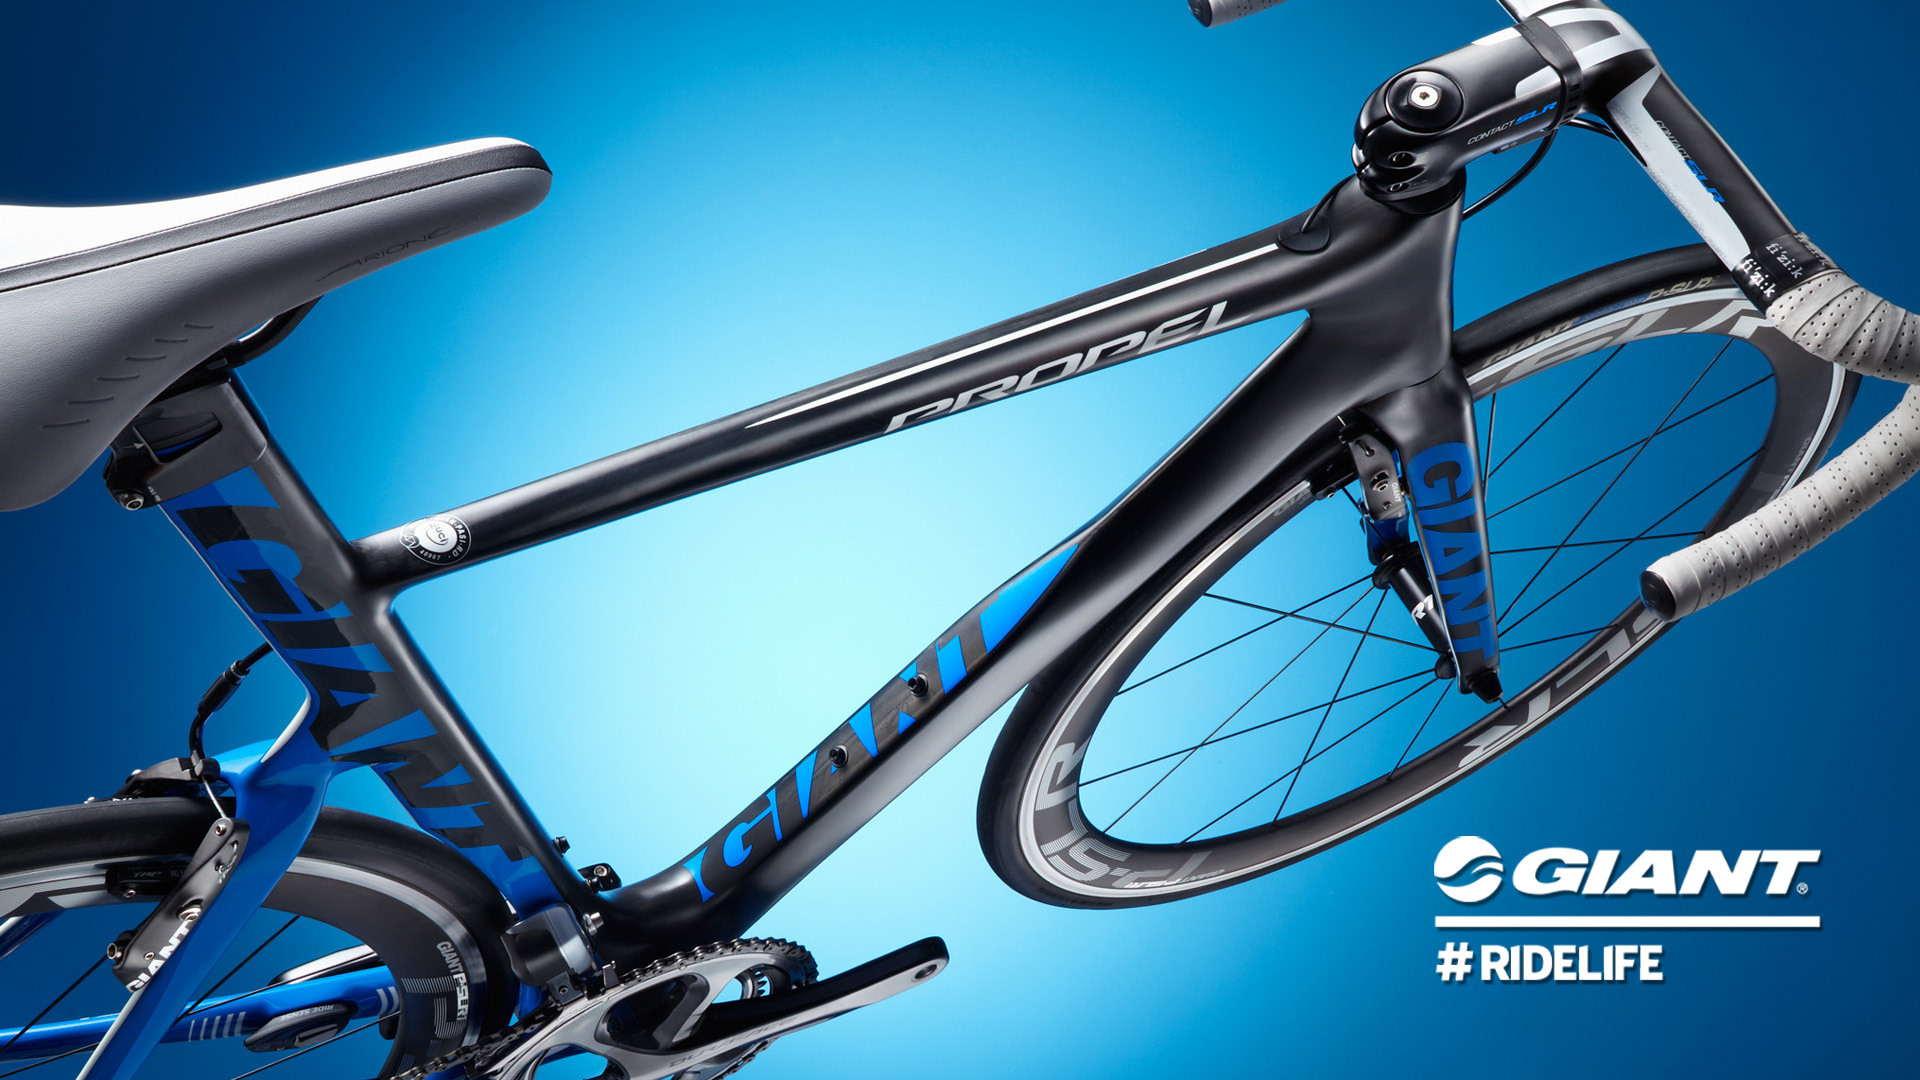 The genre defining Propel Advanced SL aero road racing bike : wind tunnel  tested, ProTour proven –leading aero tech in a sleek design .